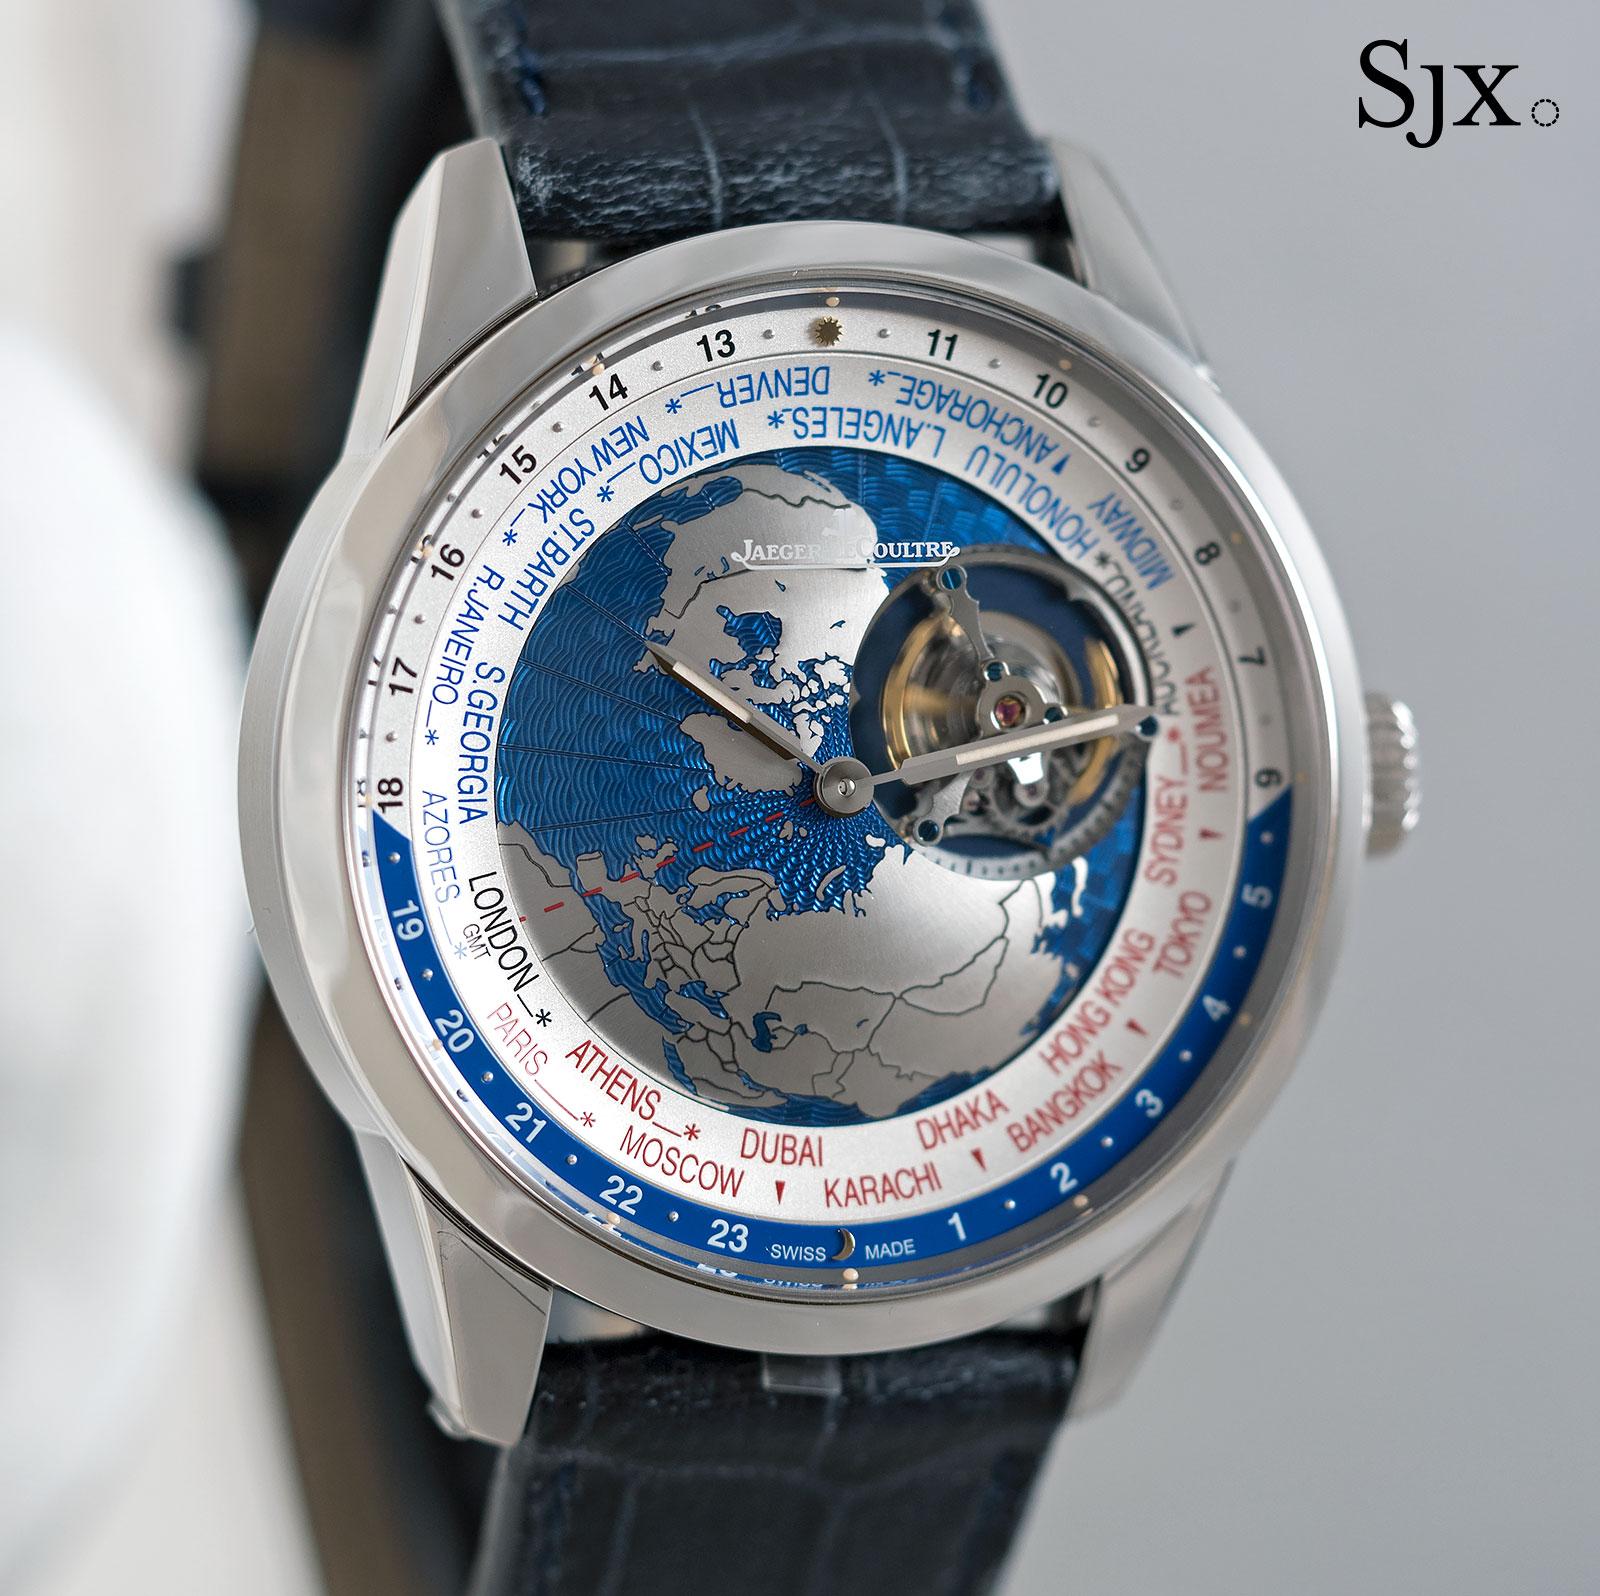 Jaeger-LeCoultre Geophysic Tourbillon Universal Time 1